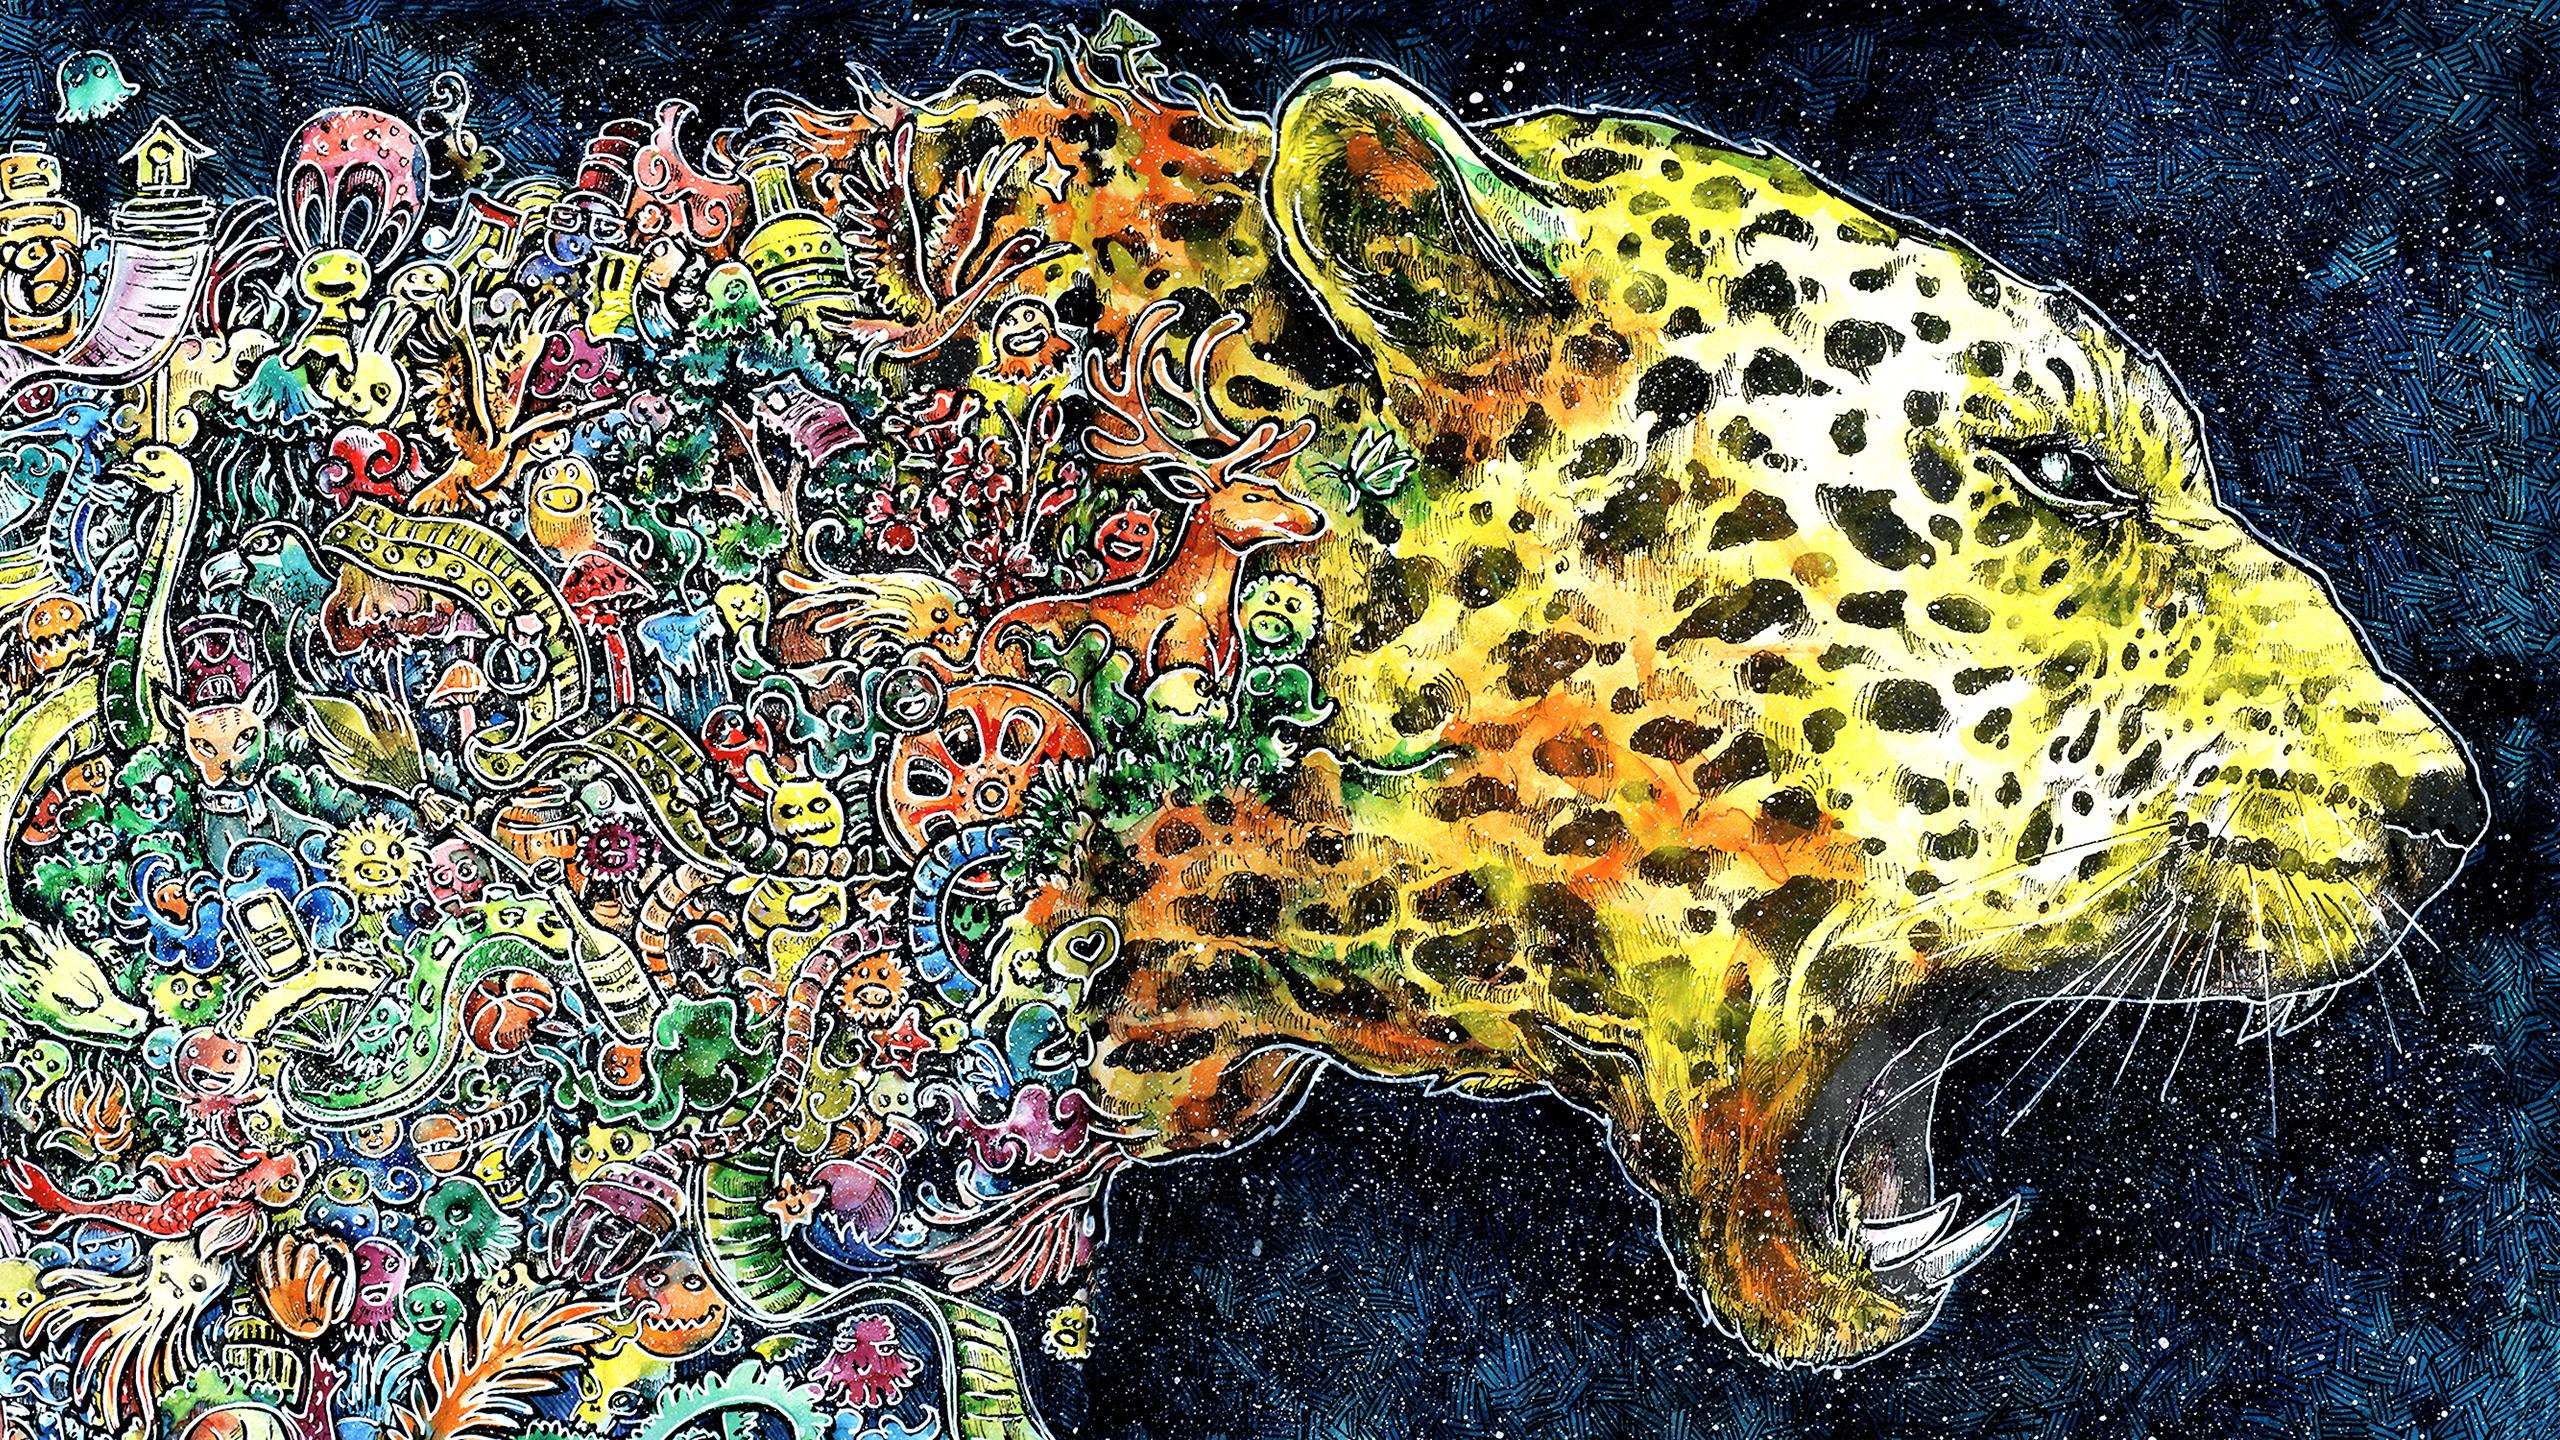 Cheetah Artwork Hd Wallpaper Background Image 2560x1440